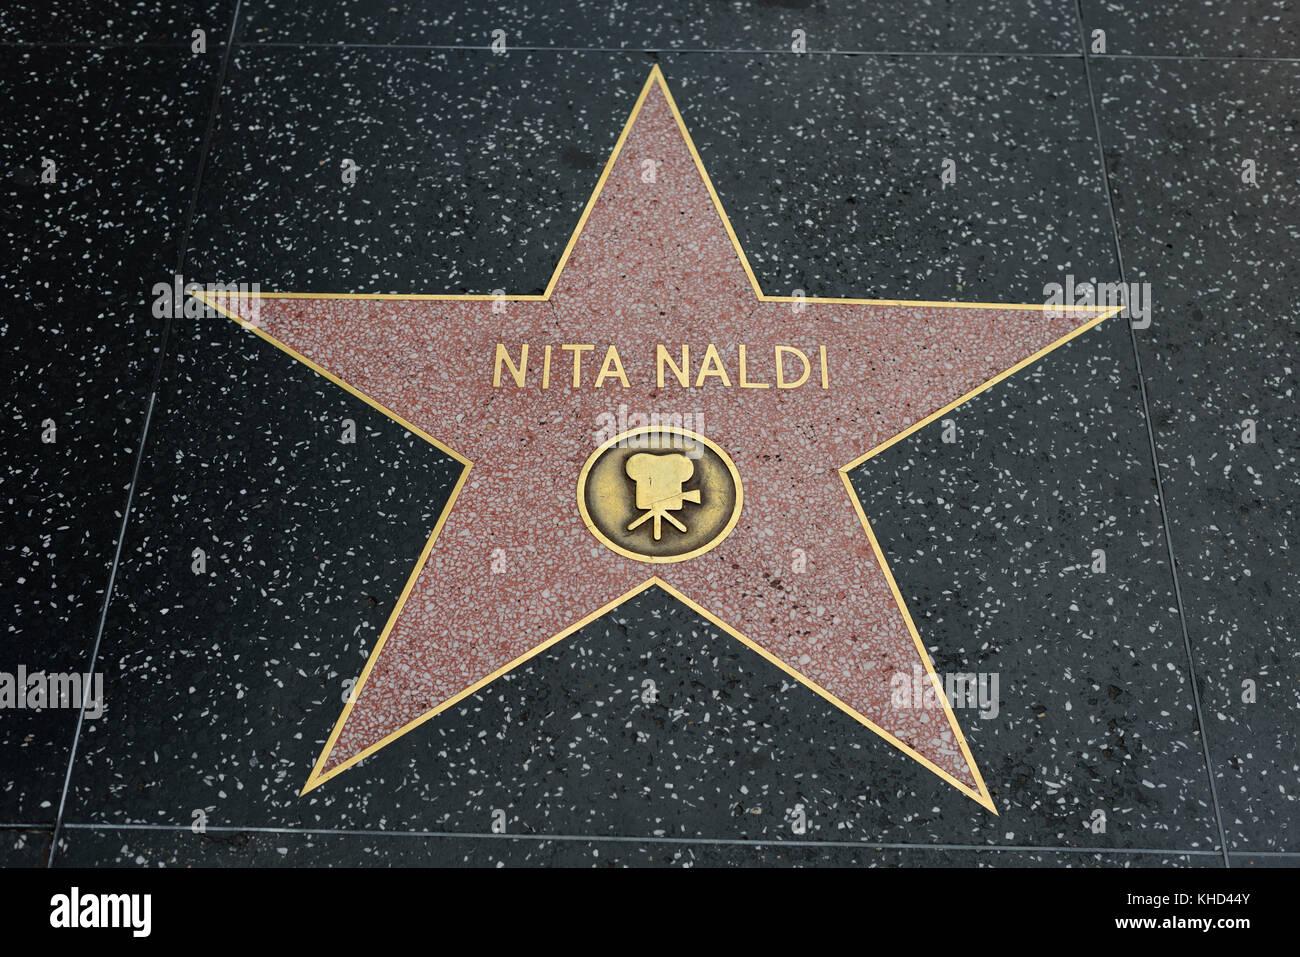 HOLLYWOOD, CA - DECEMBER 06: Nita Naldi star on the Hollywood Walk of Fame in Hollywood, California on Dec. 6, 2016. - Stock Image